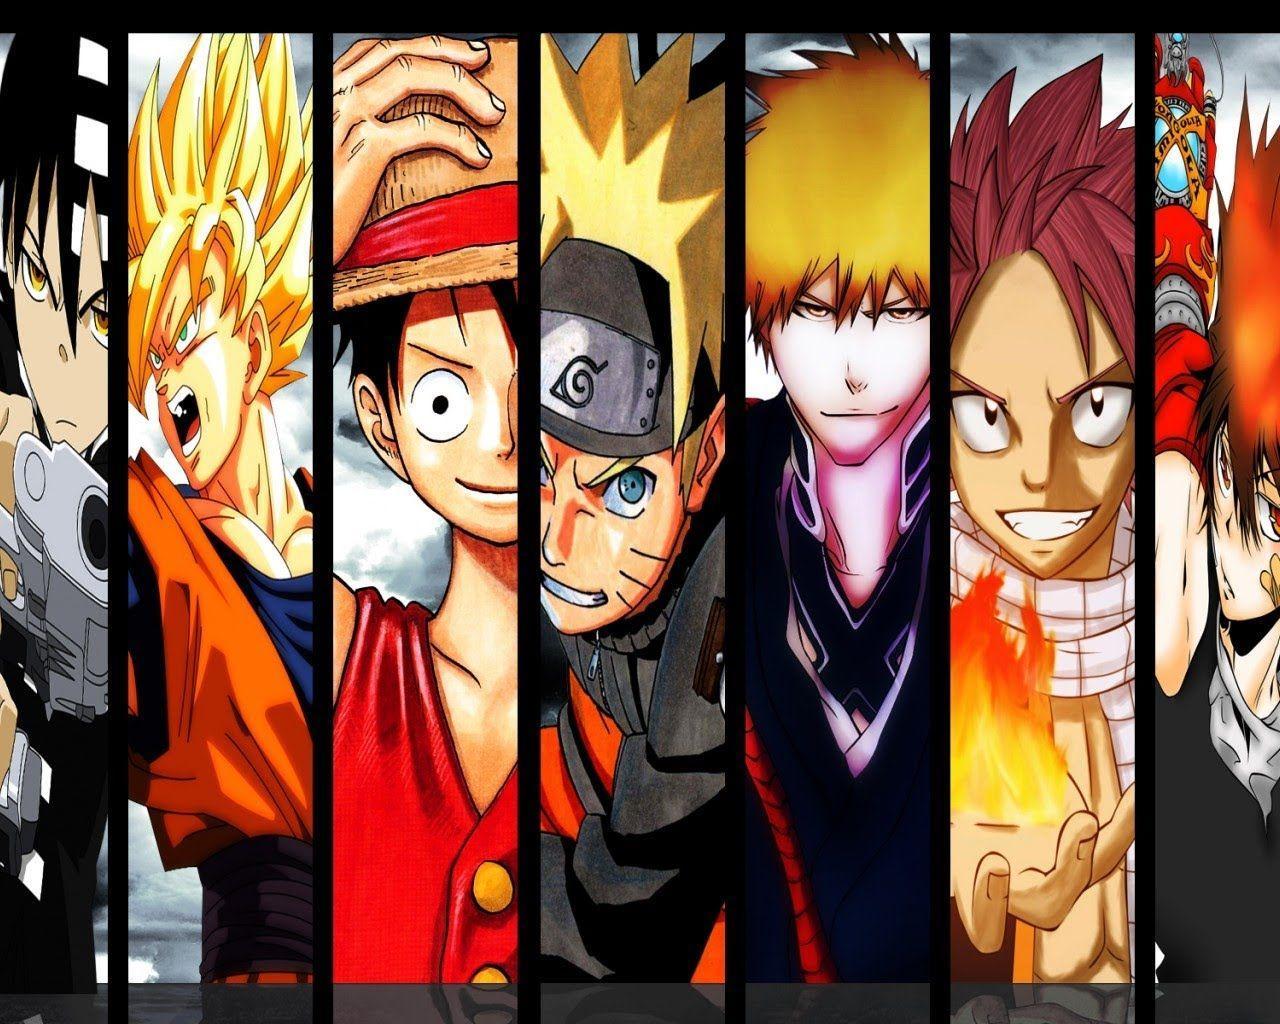 Top Anime Wallpapers Top Free Top Anime Backgrounds Wallpaperaccess 25 anime wallpaper windows 10